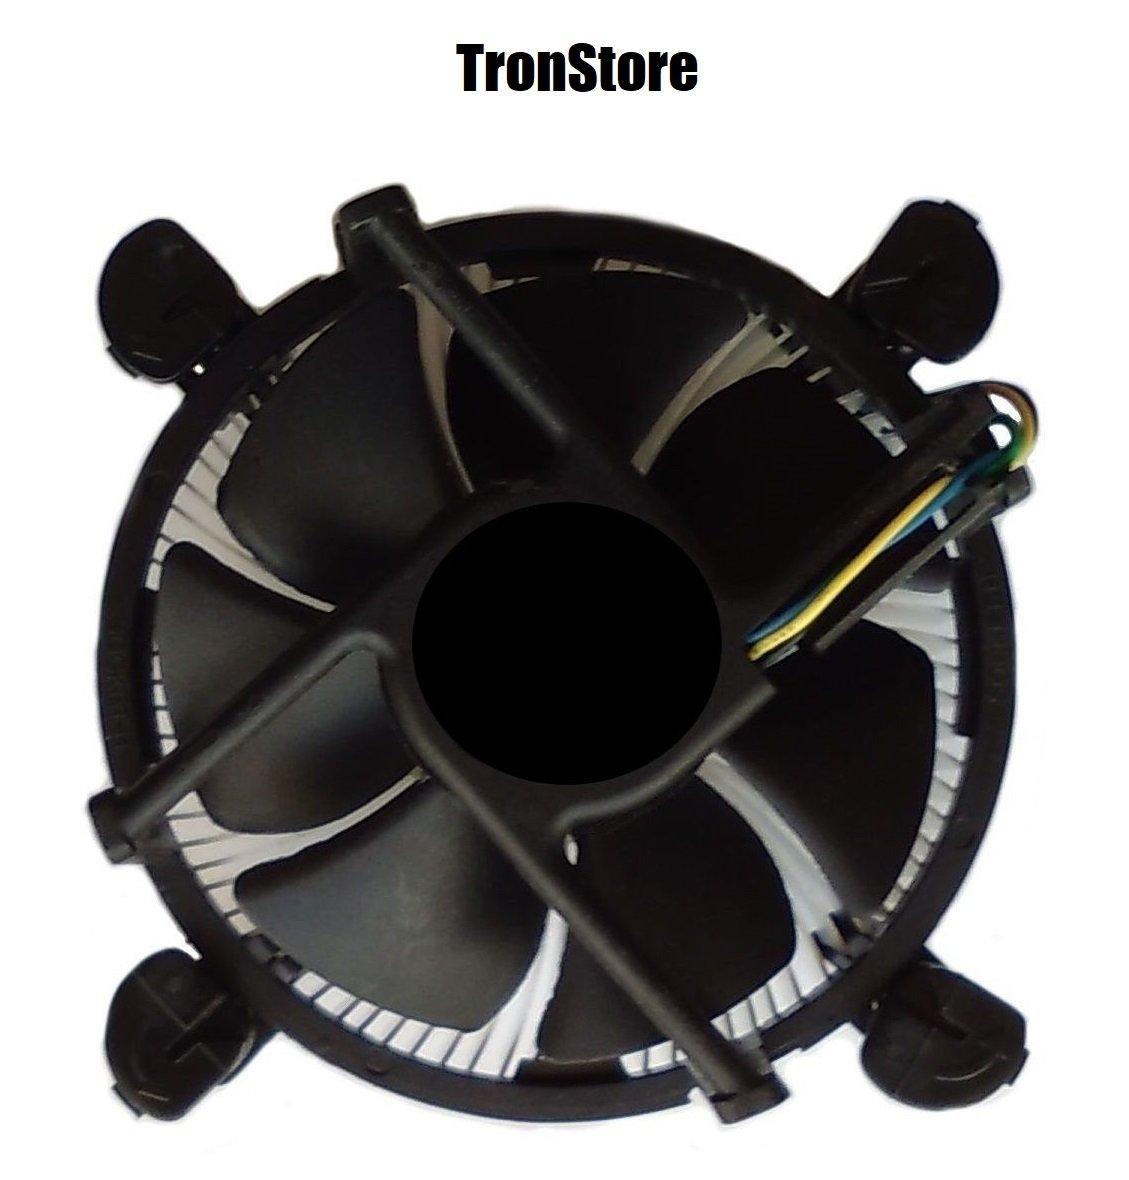 TronStore TS-1 Premium Intel Core i3 / i5 / i7 Socket 1156/1155 / 1151/1150 4-Pin Connector CPU Cooler Copper Core Base & Aluminum Heatsink & 3.5-inch Fan Pre-Applied Thermal Paste